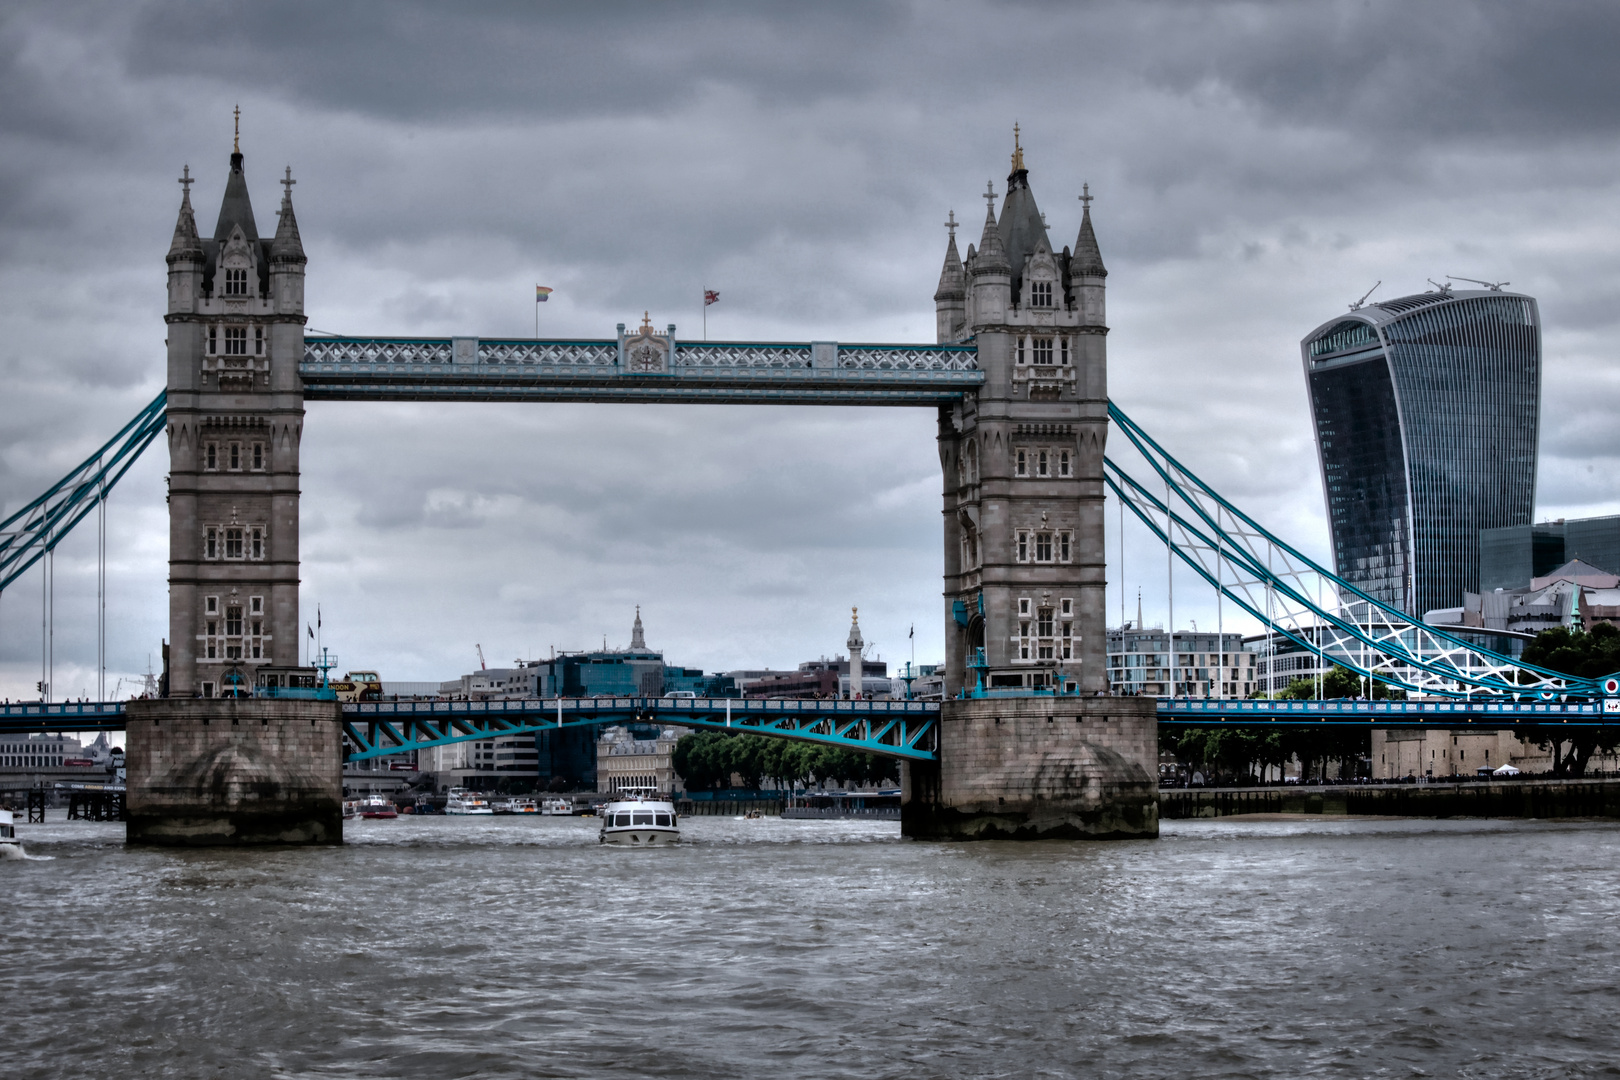 tower bridge foto bild london world tower bridge bilder auf fotocommunity. Black Bedroom Furniture Sets. Home Design Ideas